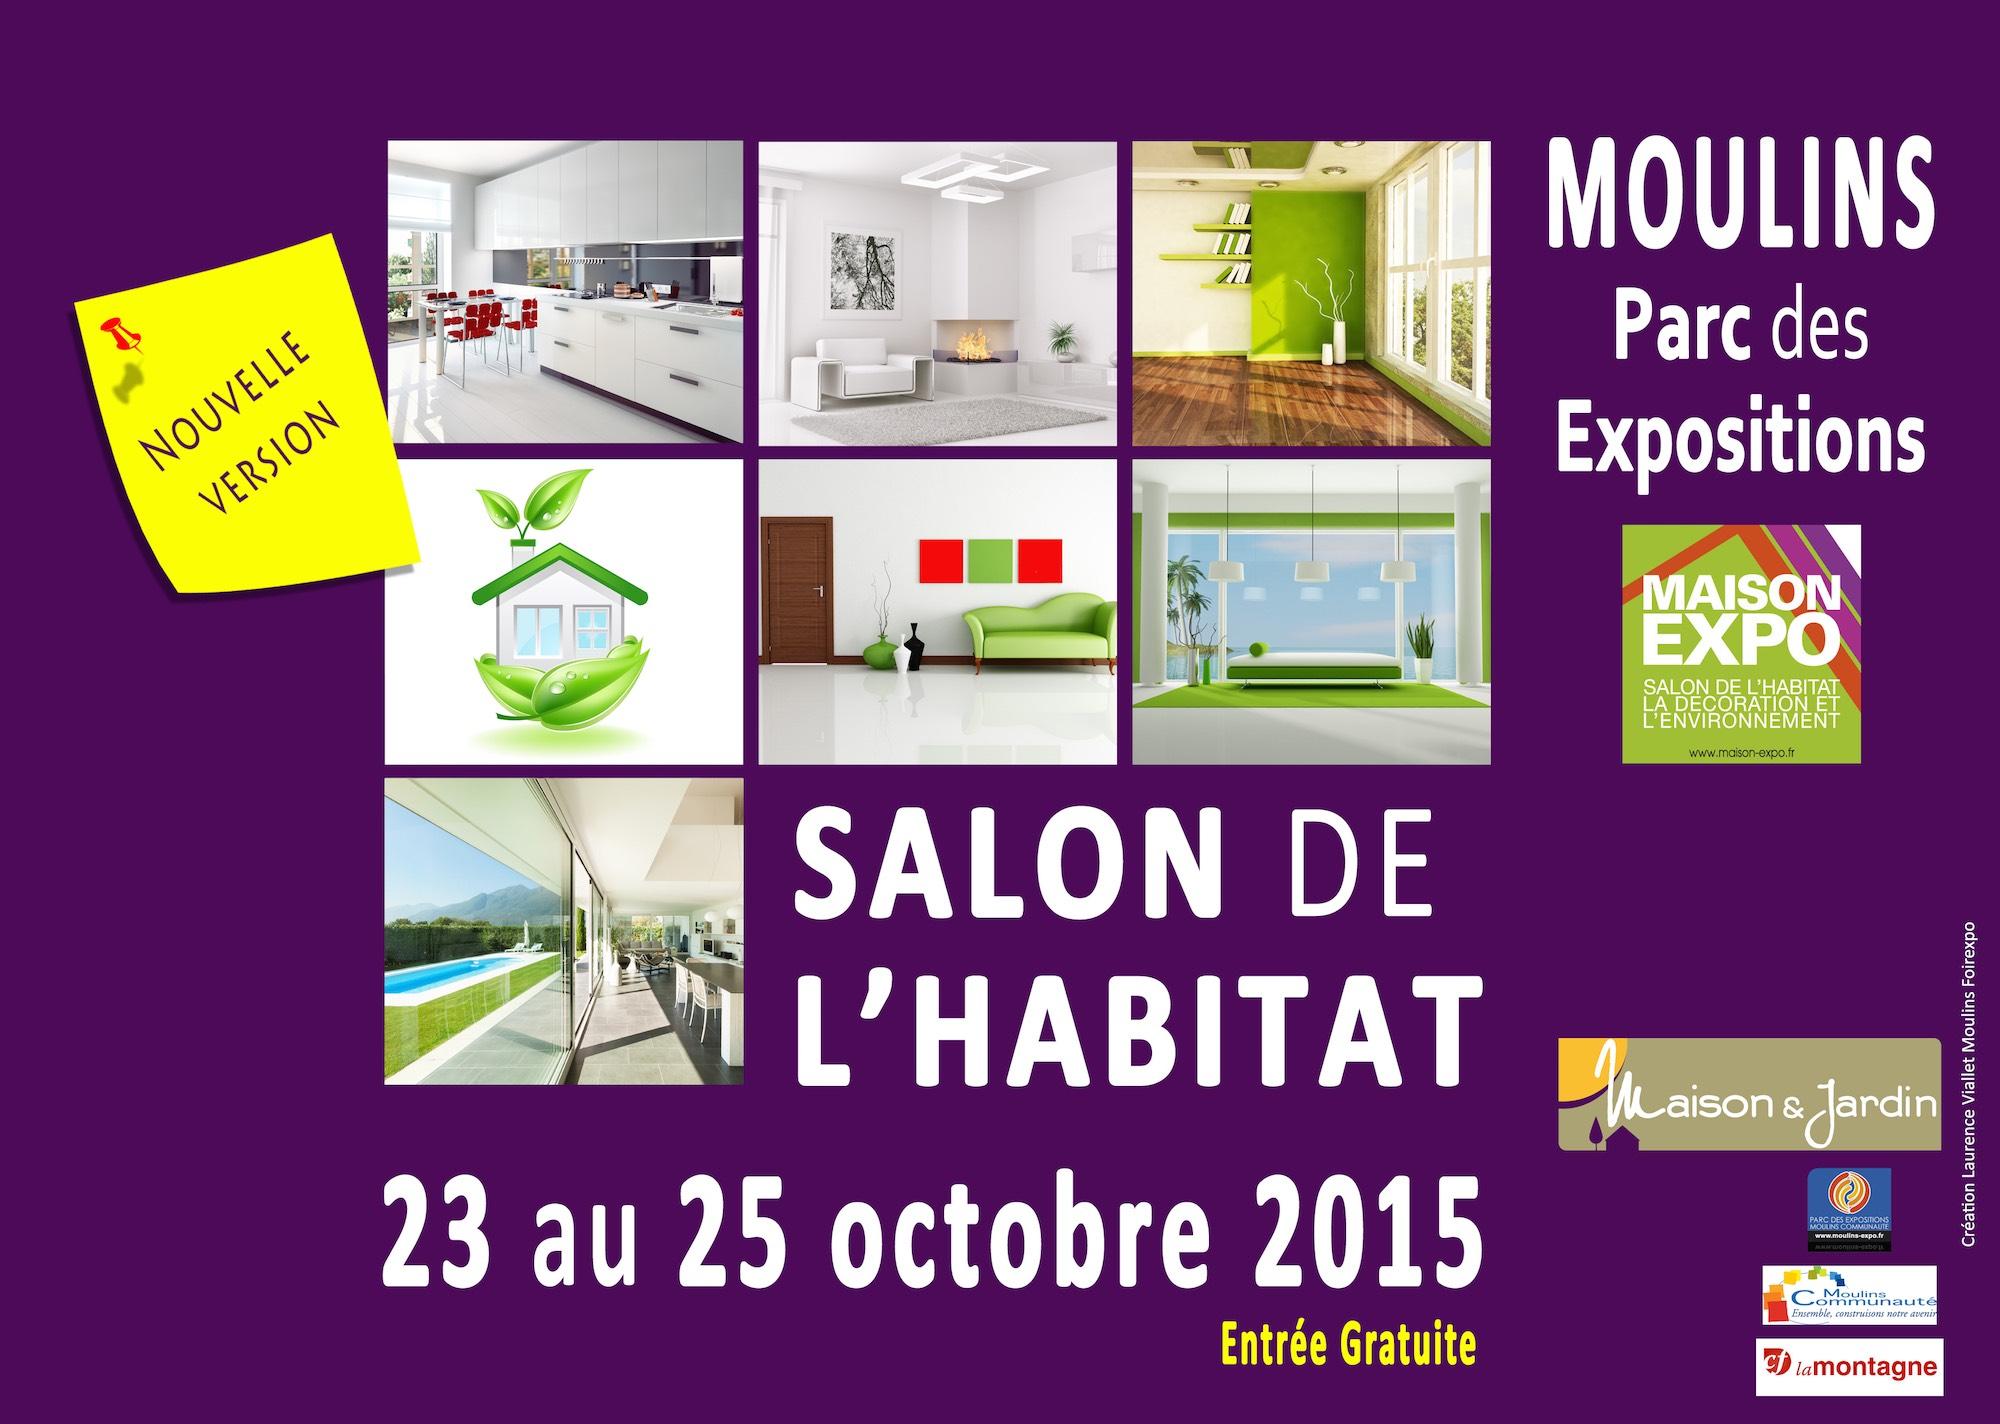 Salon habitat moulins 2015 for Habitat jardin 2015